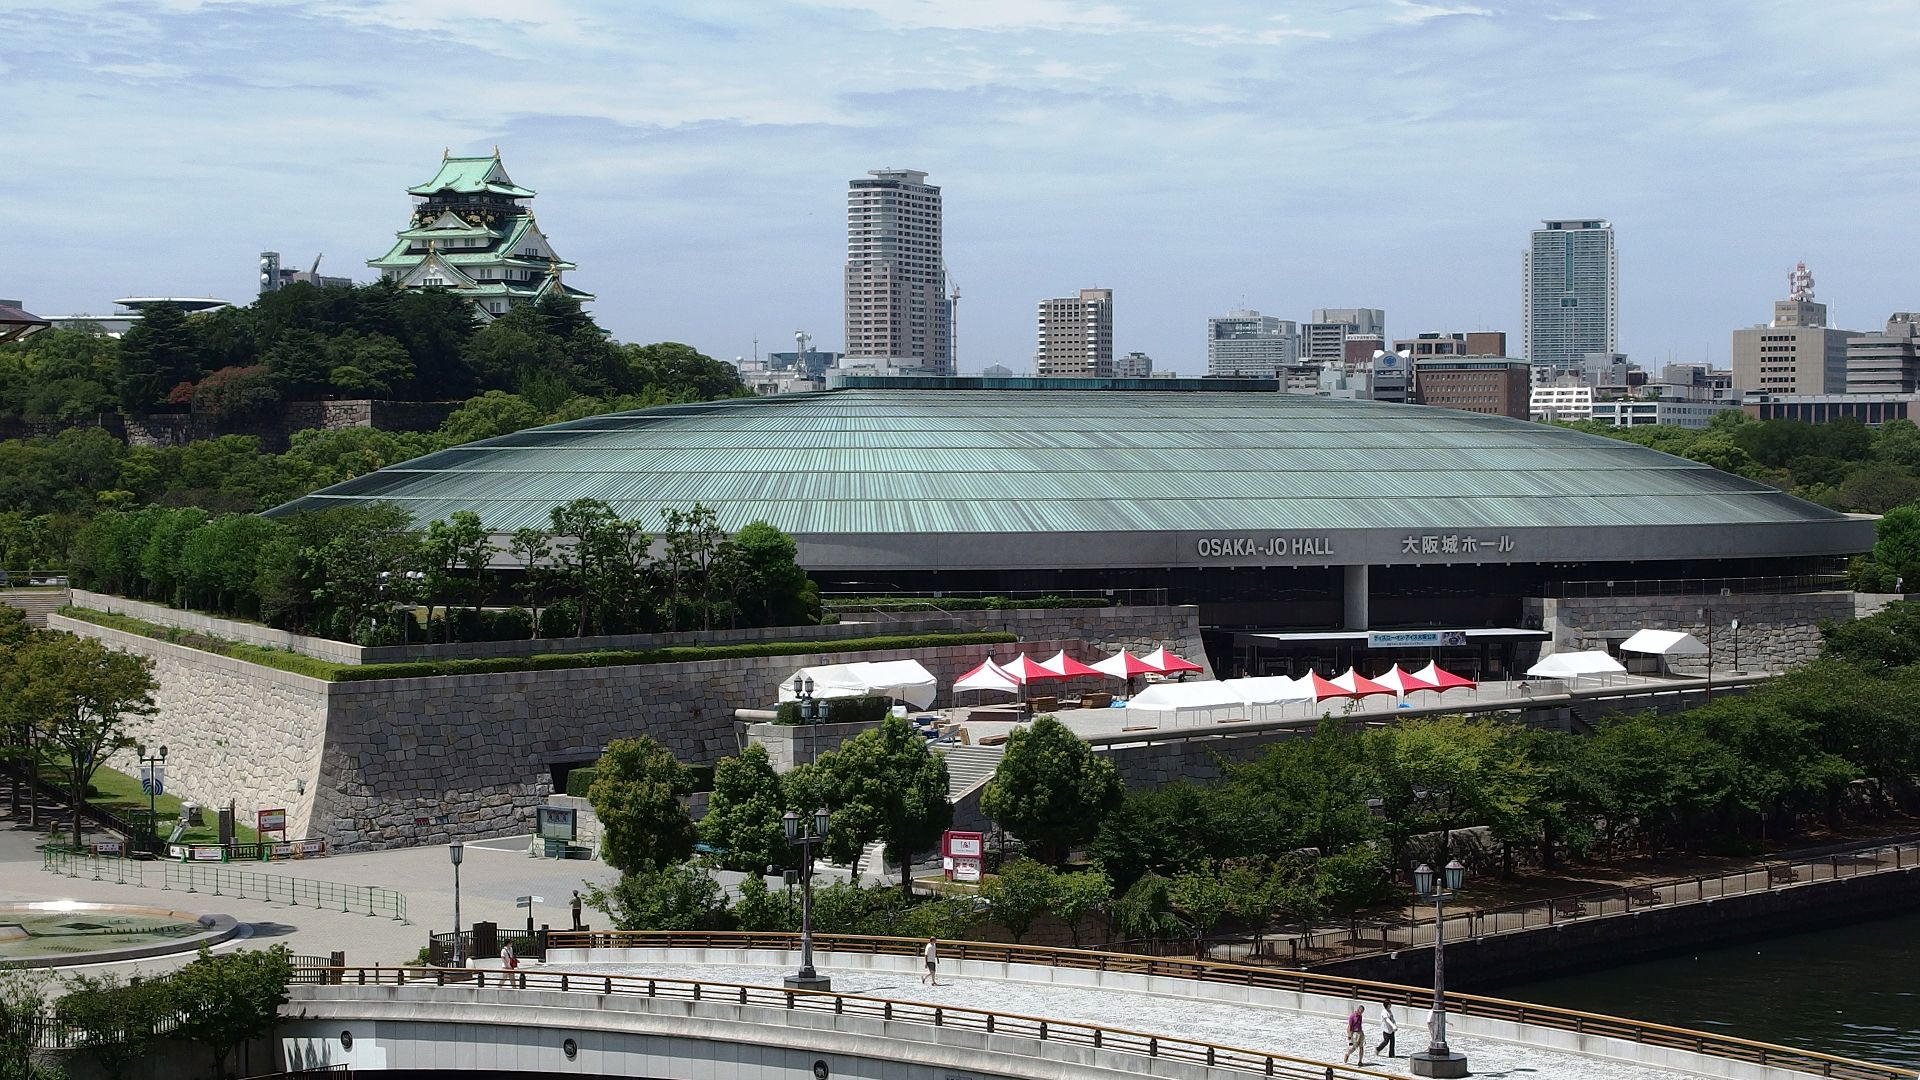 1920px-Osaka-jo_Hall_in_201408.JPG